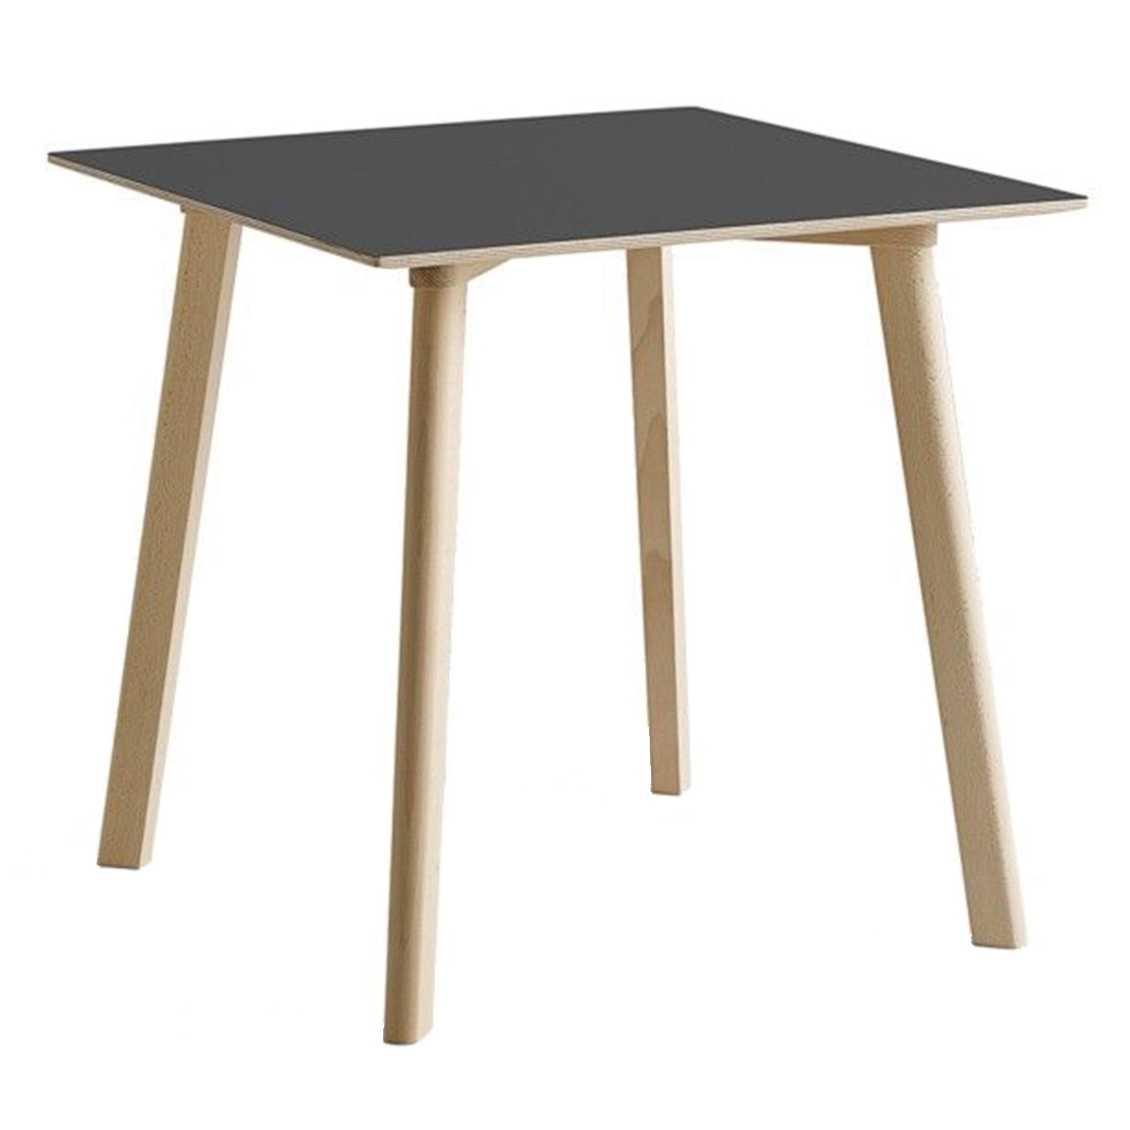 vierkante-eettafel-75-x-75-beech-untreated-stone-grey-laminate